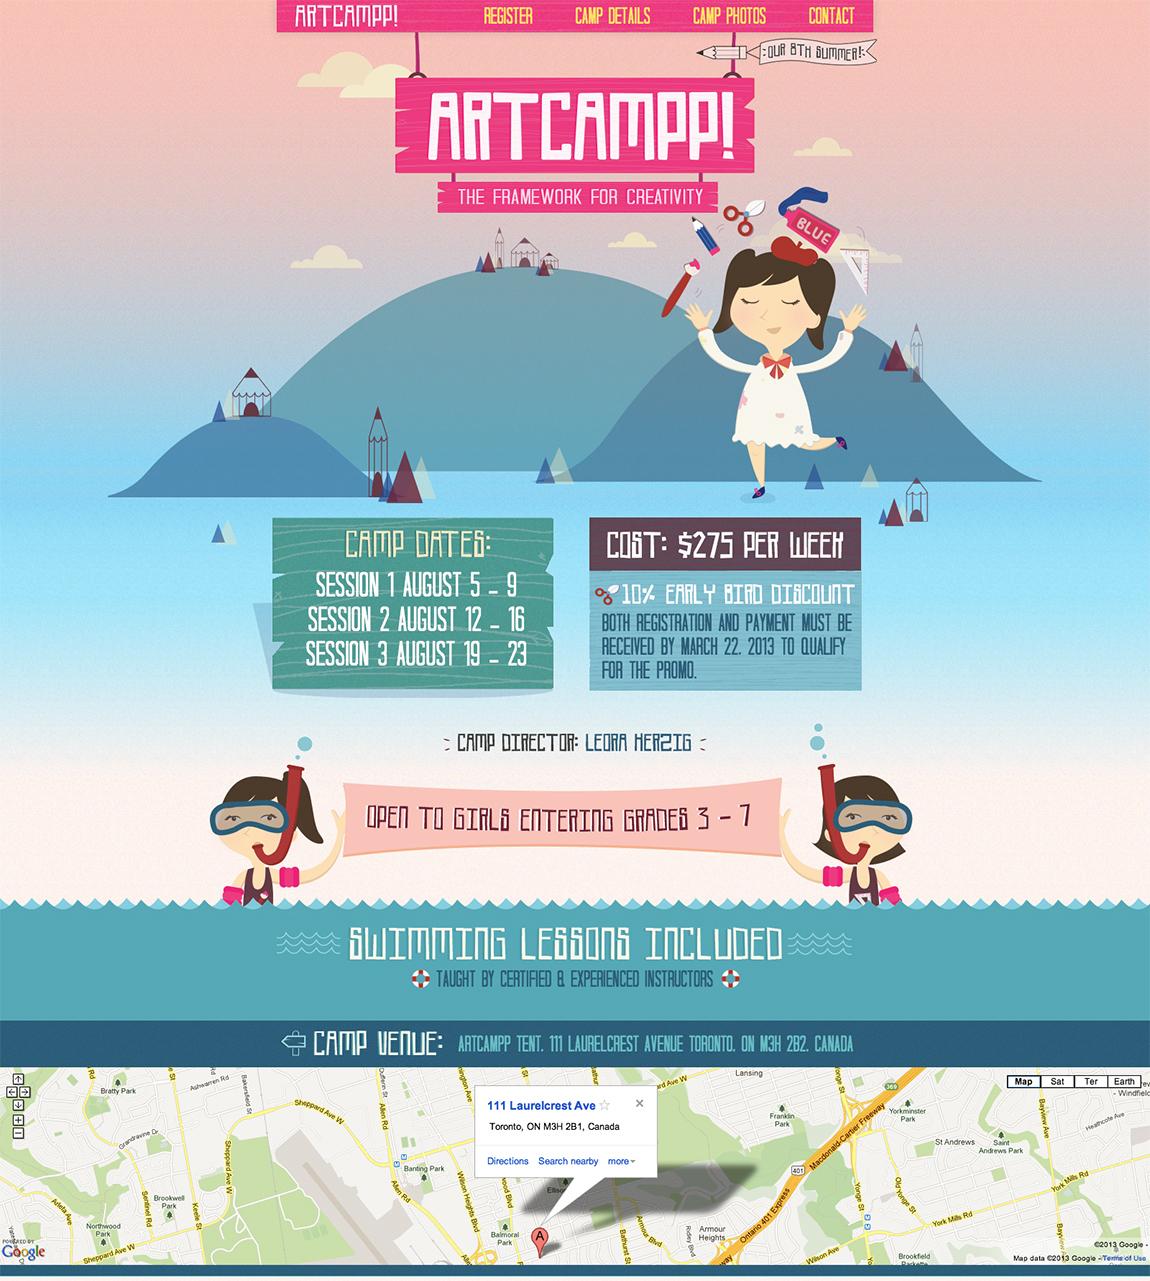 Artcampp 2013 Website Screenshot